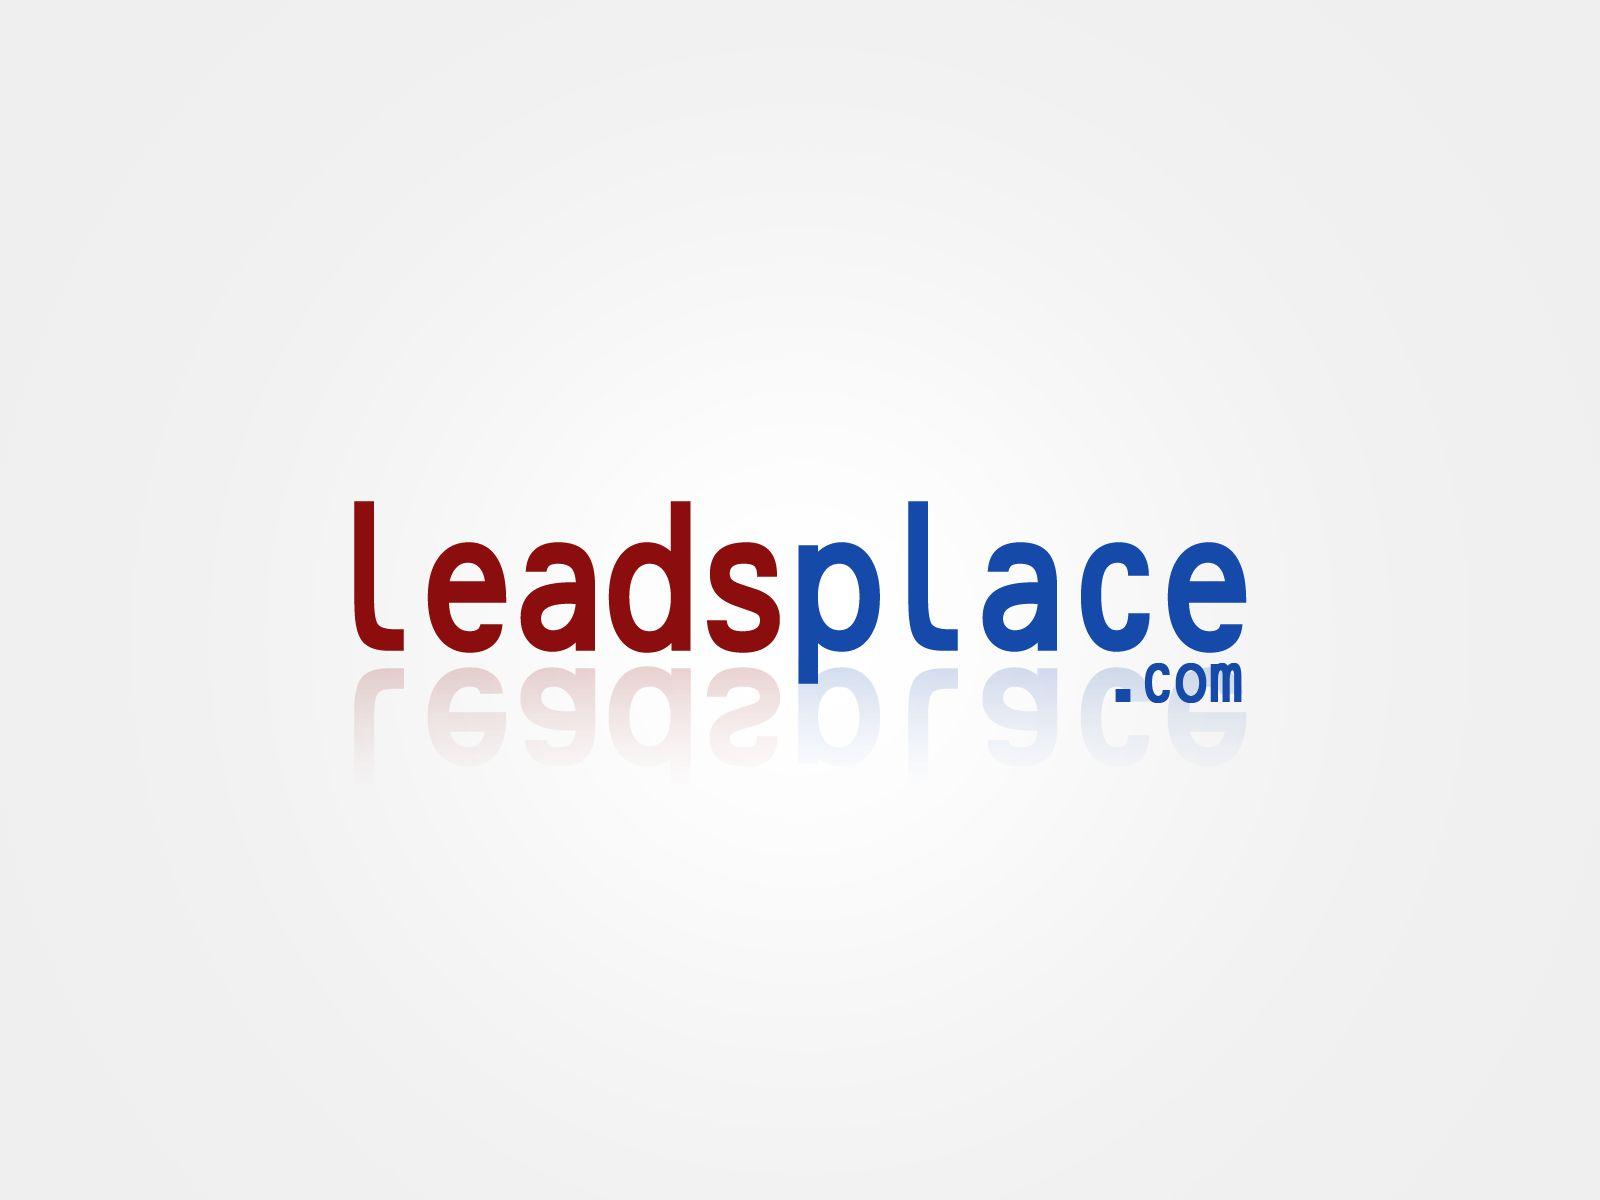 leadsplace.com - логотип - дизайнер bonvian